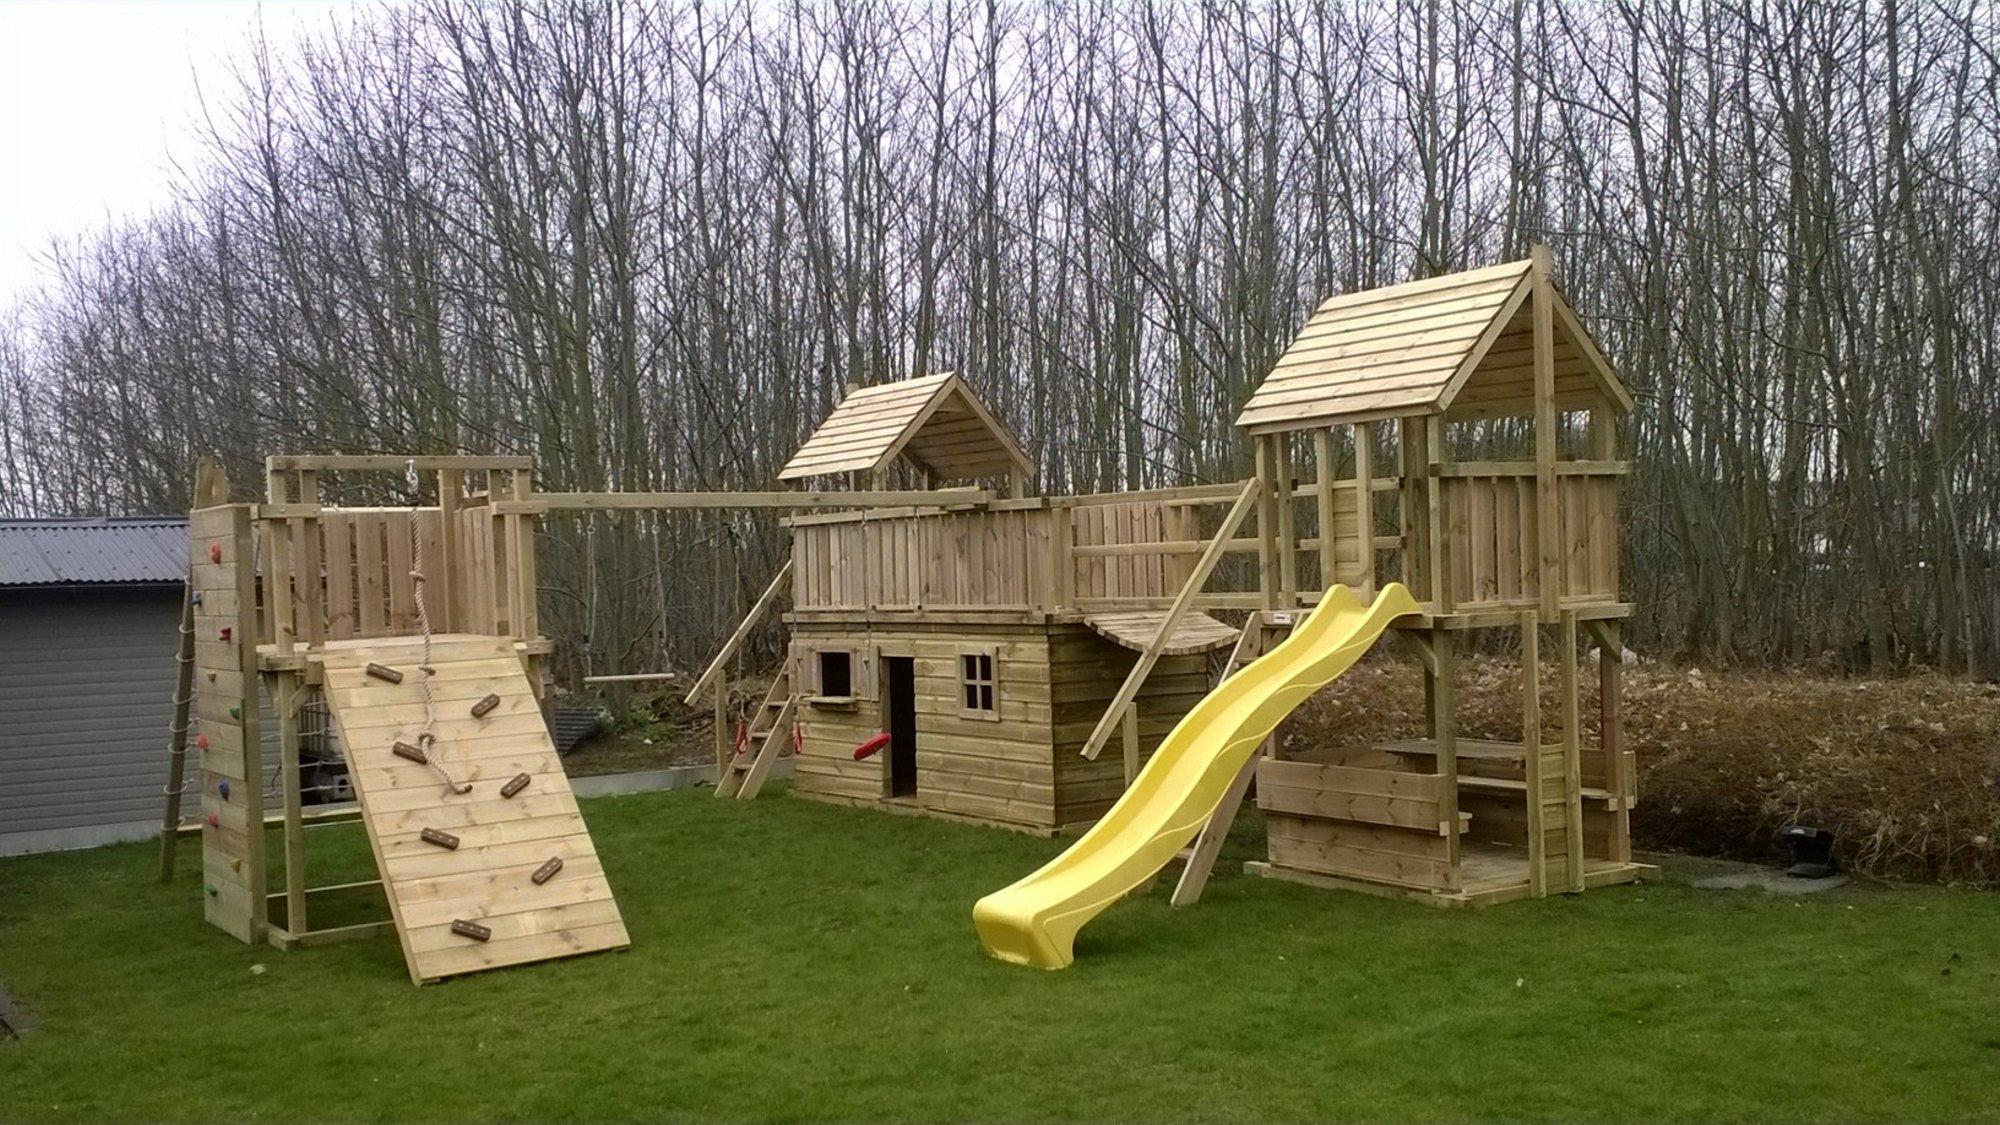 Speeltoestel Kleine Tuin : Tuin speeltoestel speeltoestel kiosk 120 van douglas hout met glijbaan